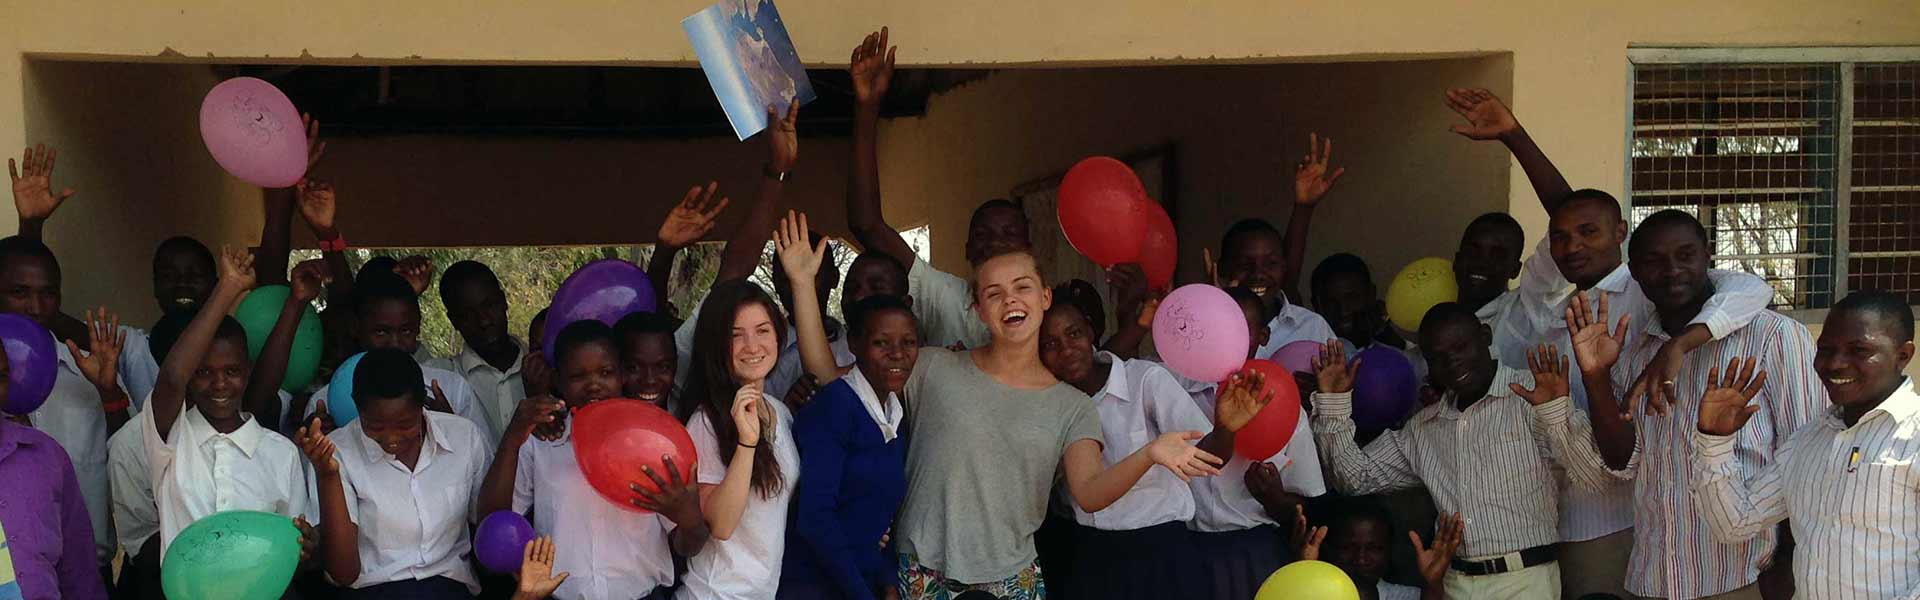 Aiducatius帮助非洲、南美洲的孩子们获得接受教育的机会